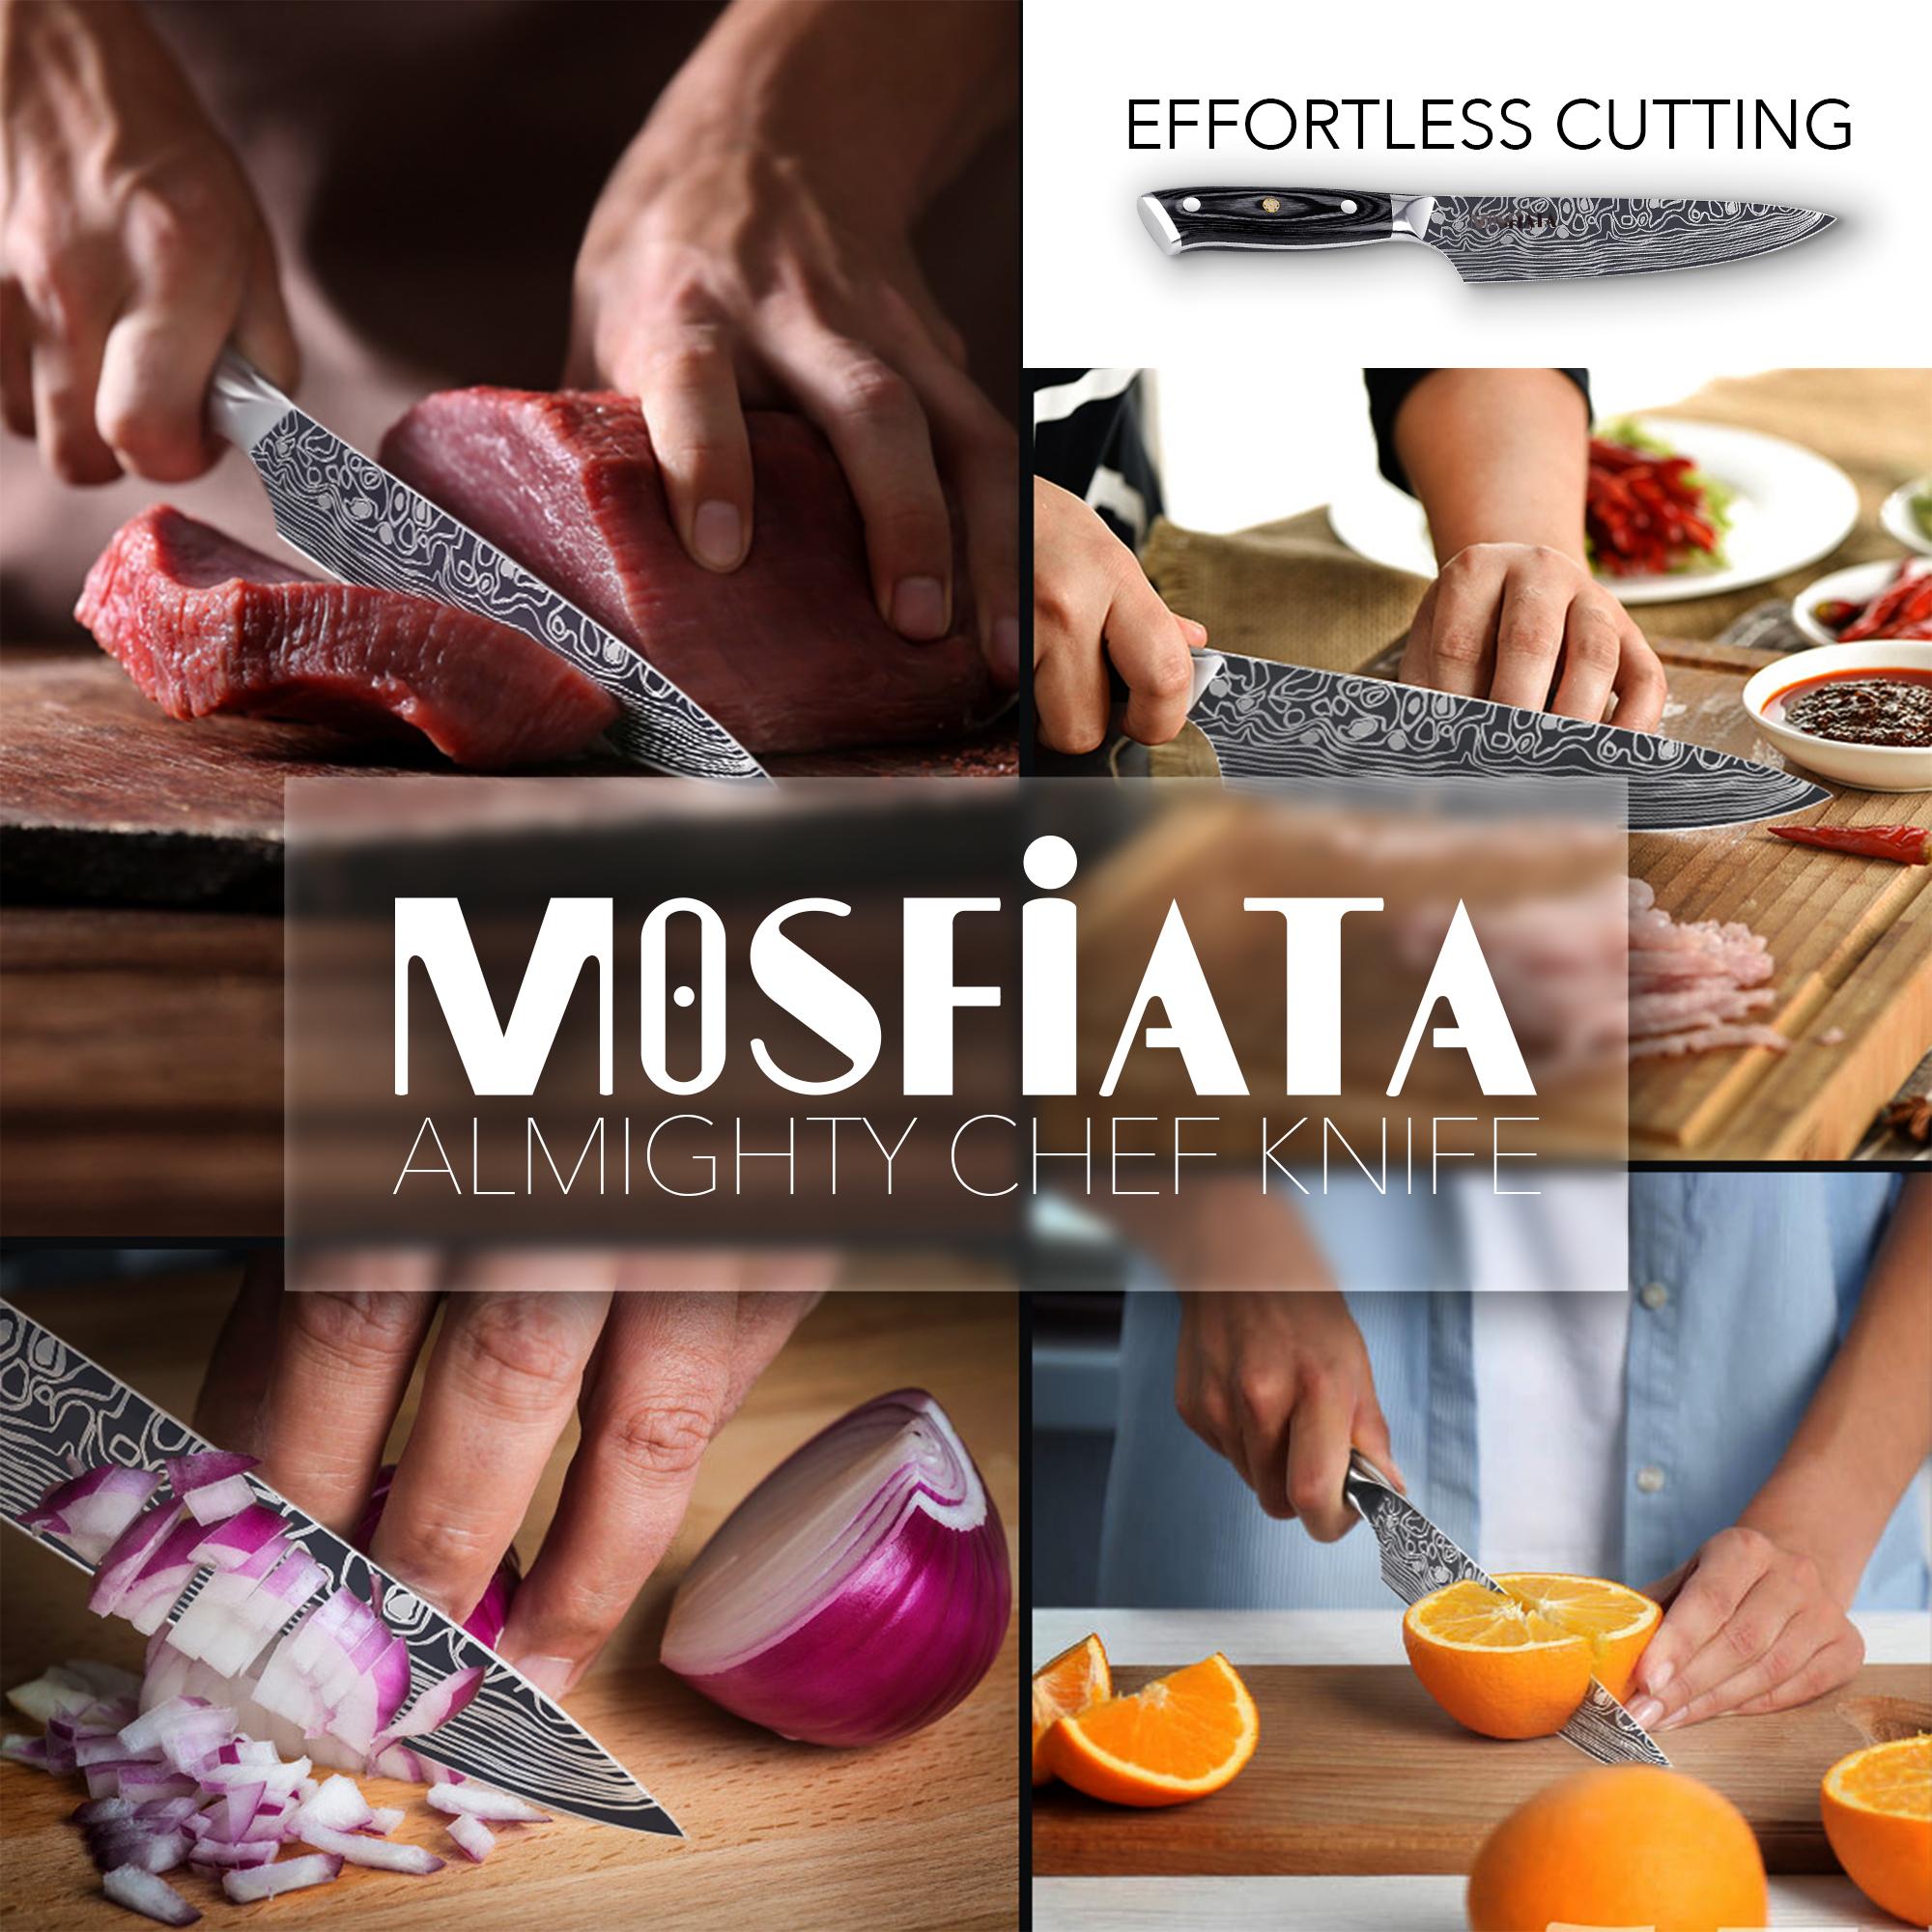 Almighty chef knife.jpg